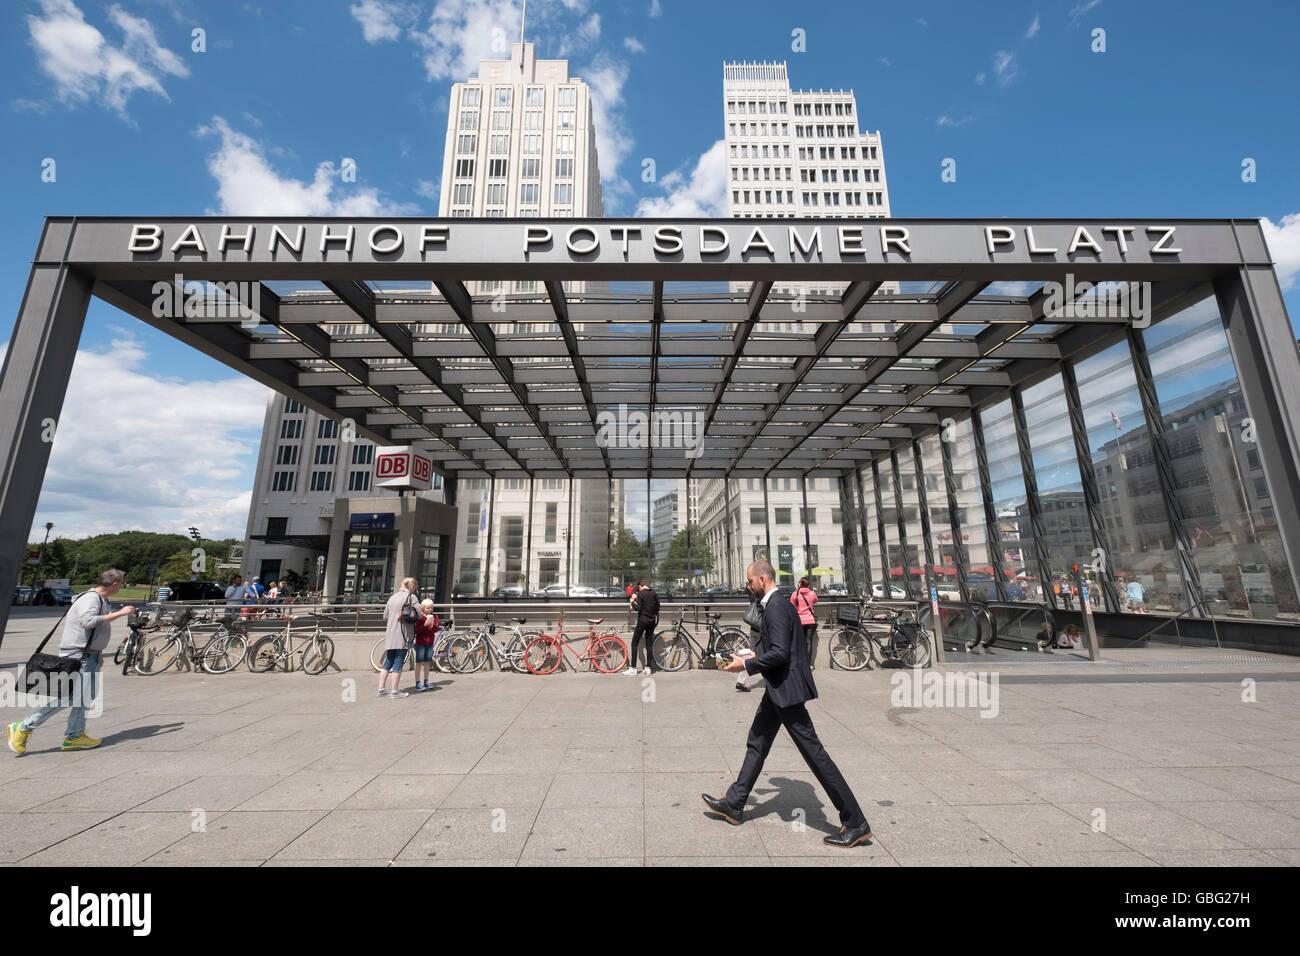 Eingang-Potsdamer Platz-Bahnhof am Potsdamer Platz in Berlin-Deutschland Stockbild